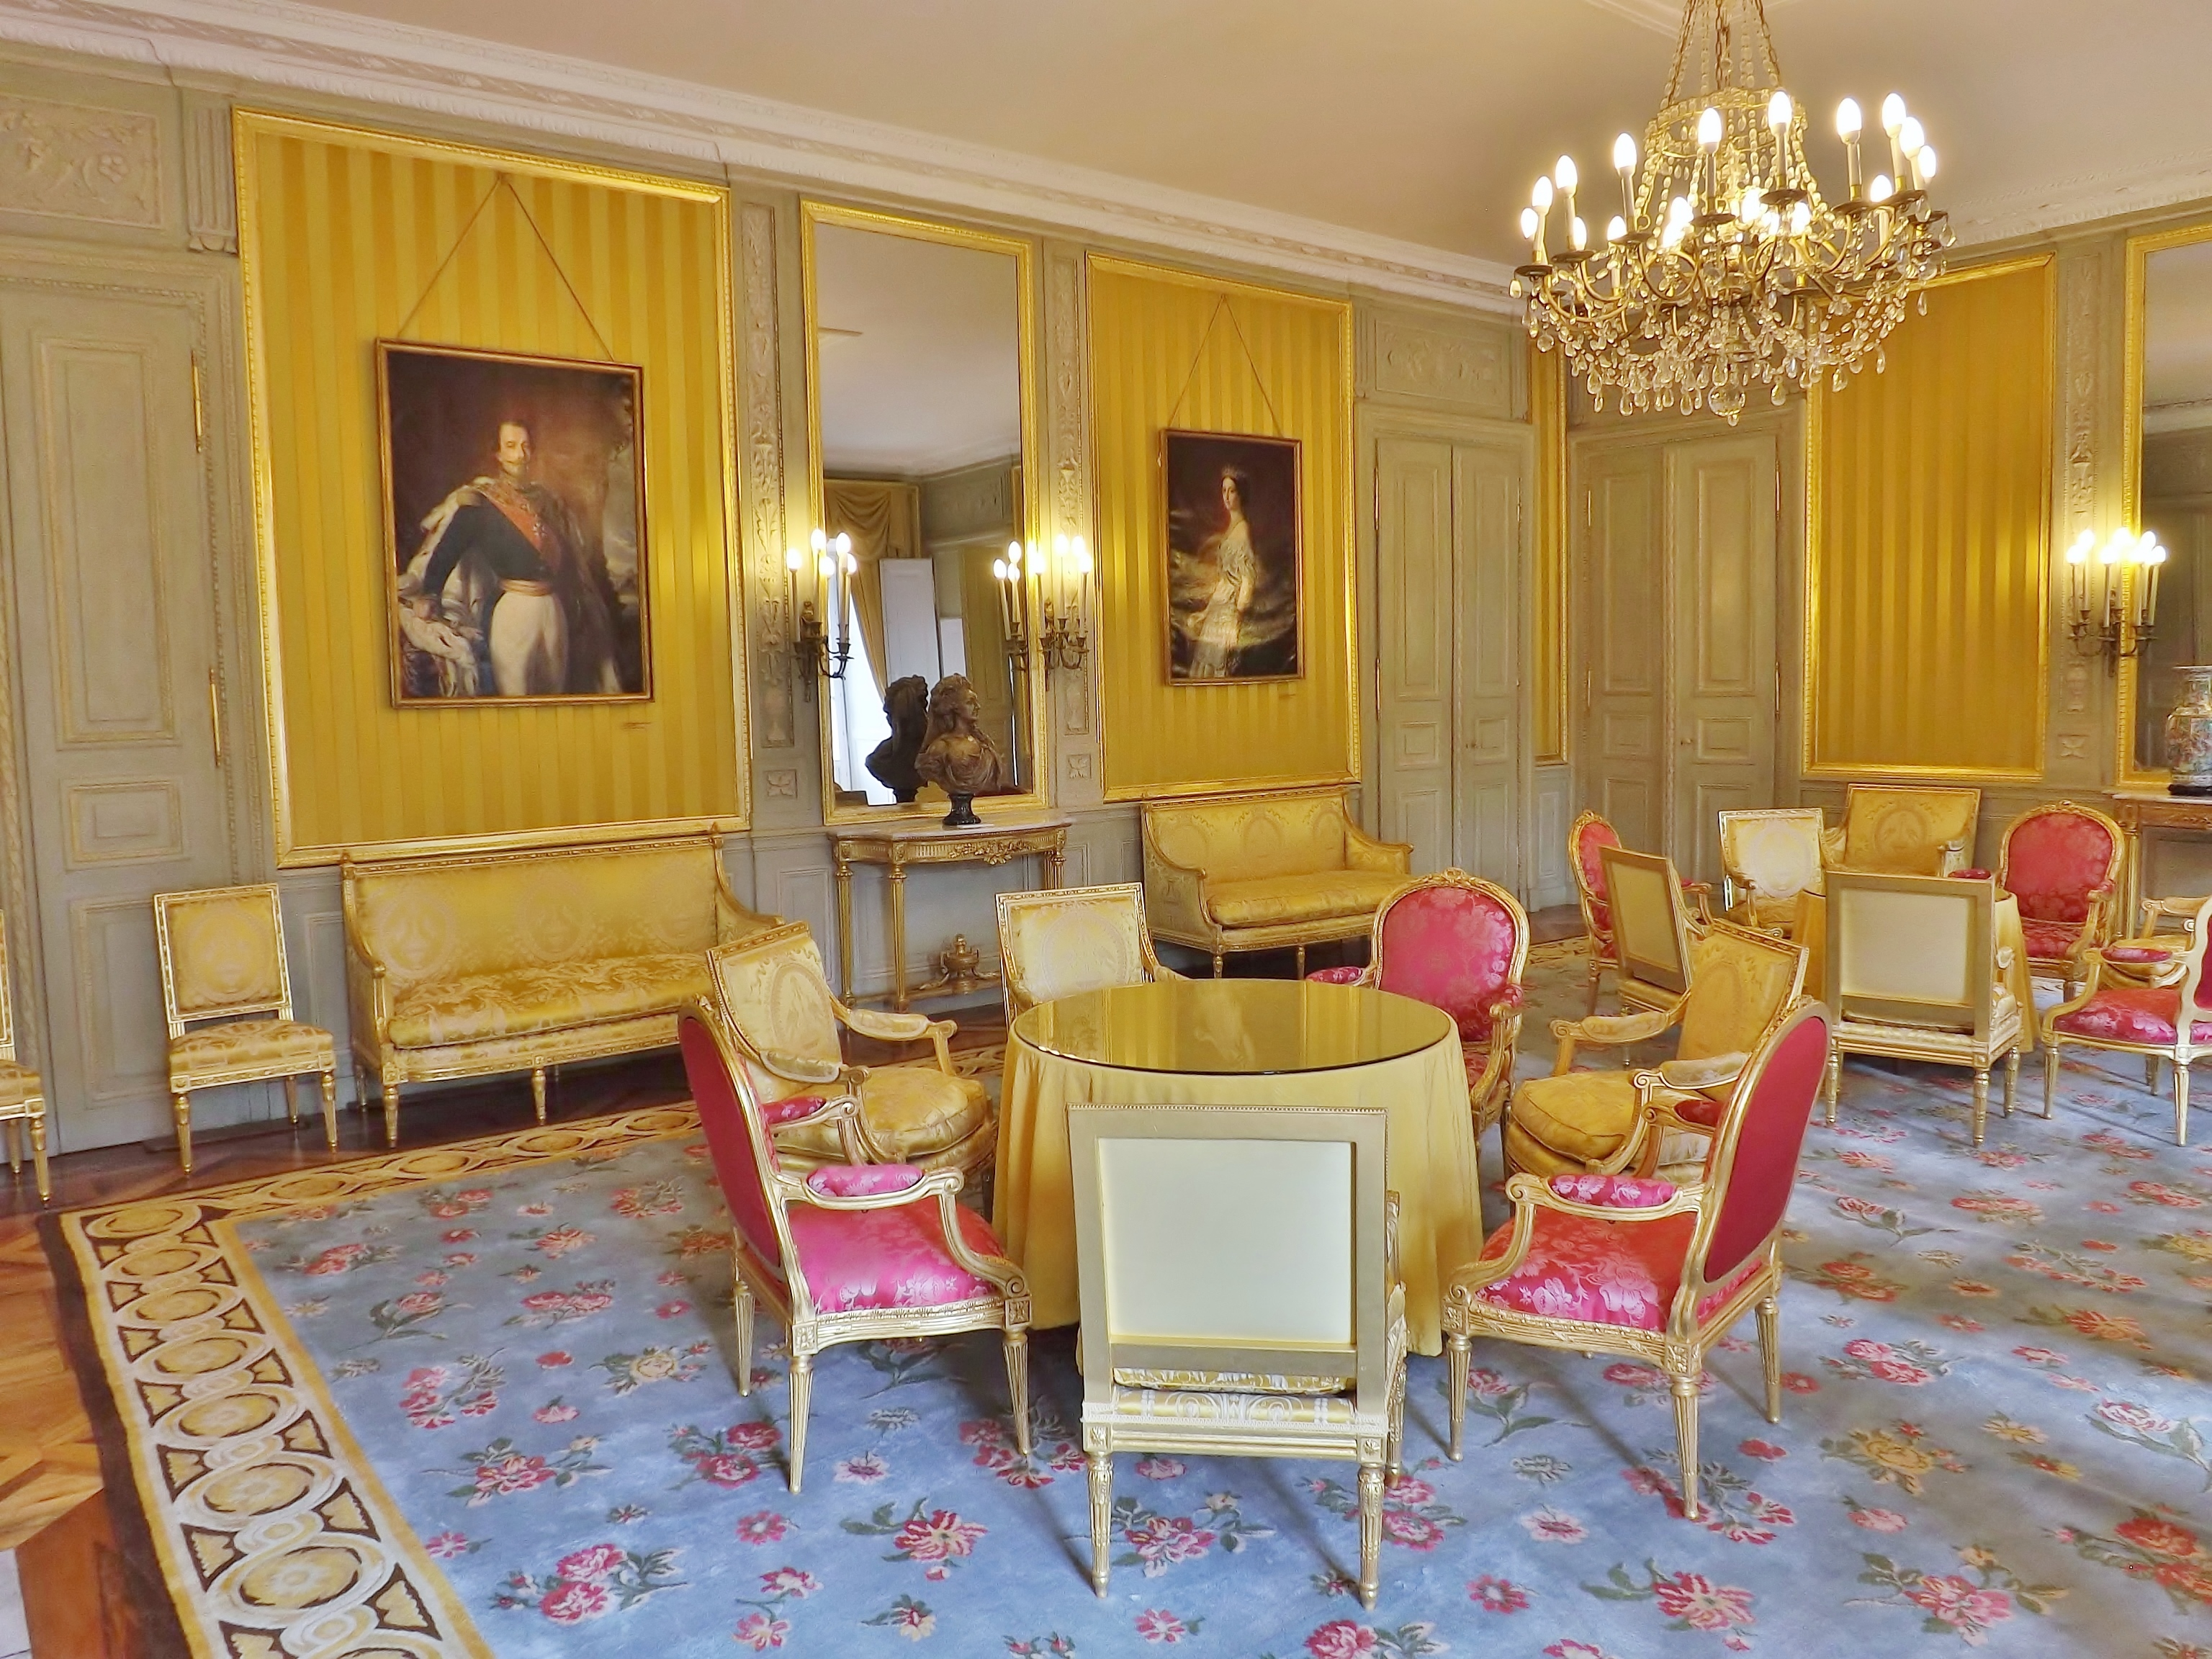 fichier salon jaune ch teau de chamb ry 2014 2 jpg wikip dia. Black Bedroom Furniture Sets. Home Design Ideas